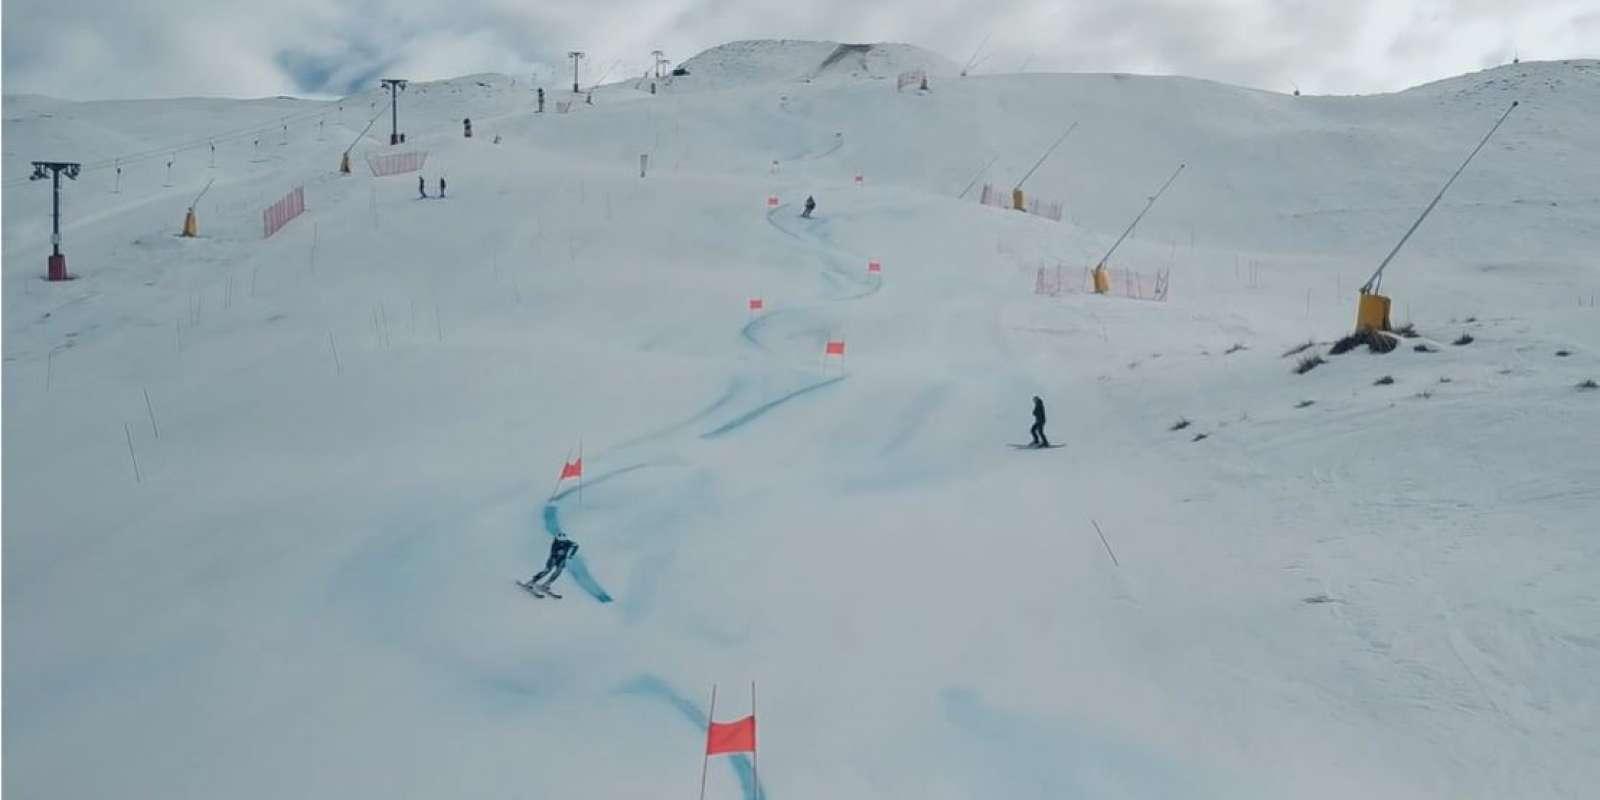 Training on Coronet Peak